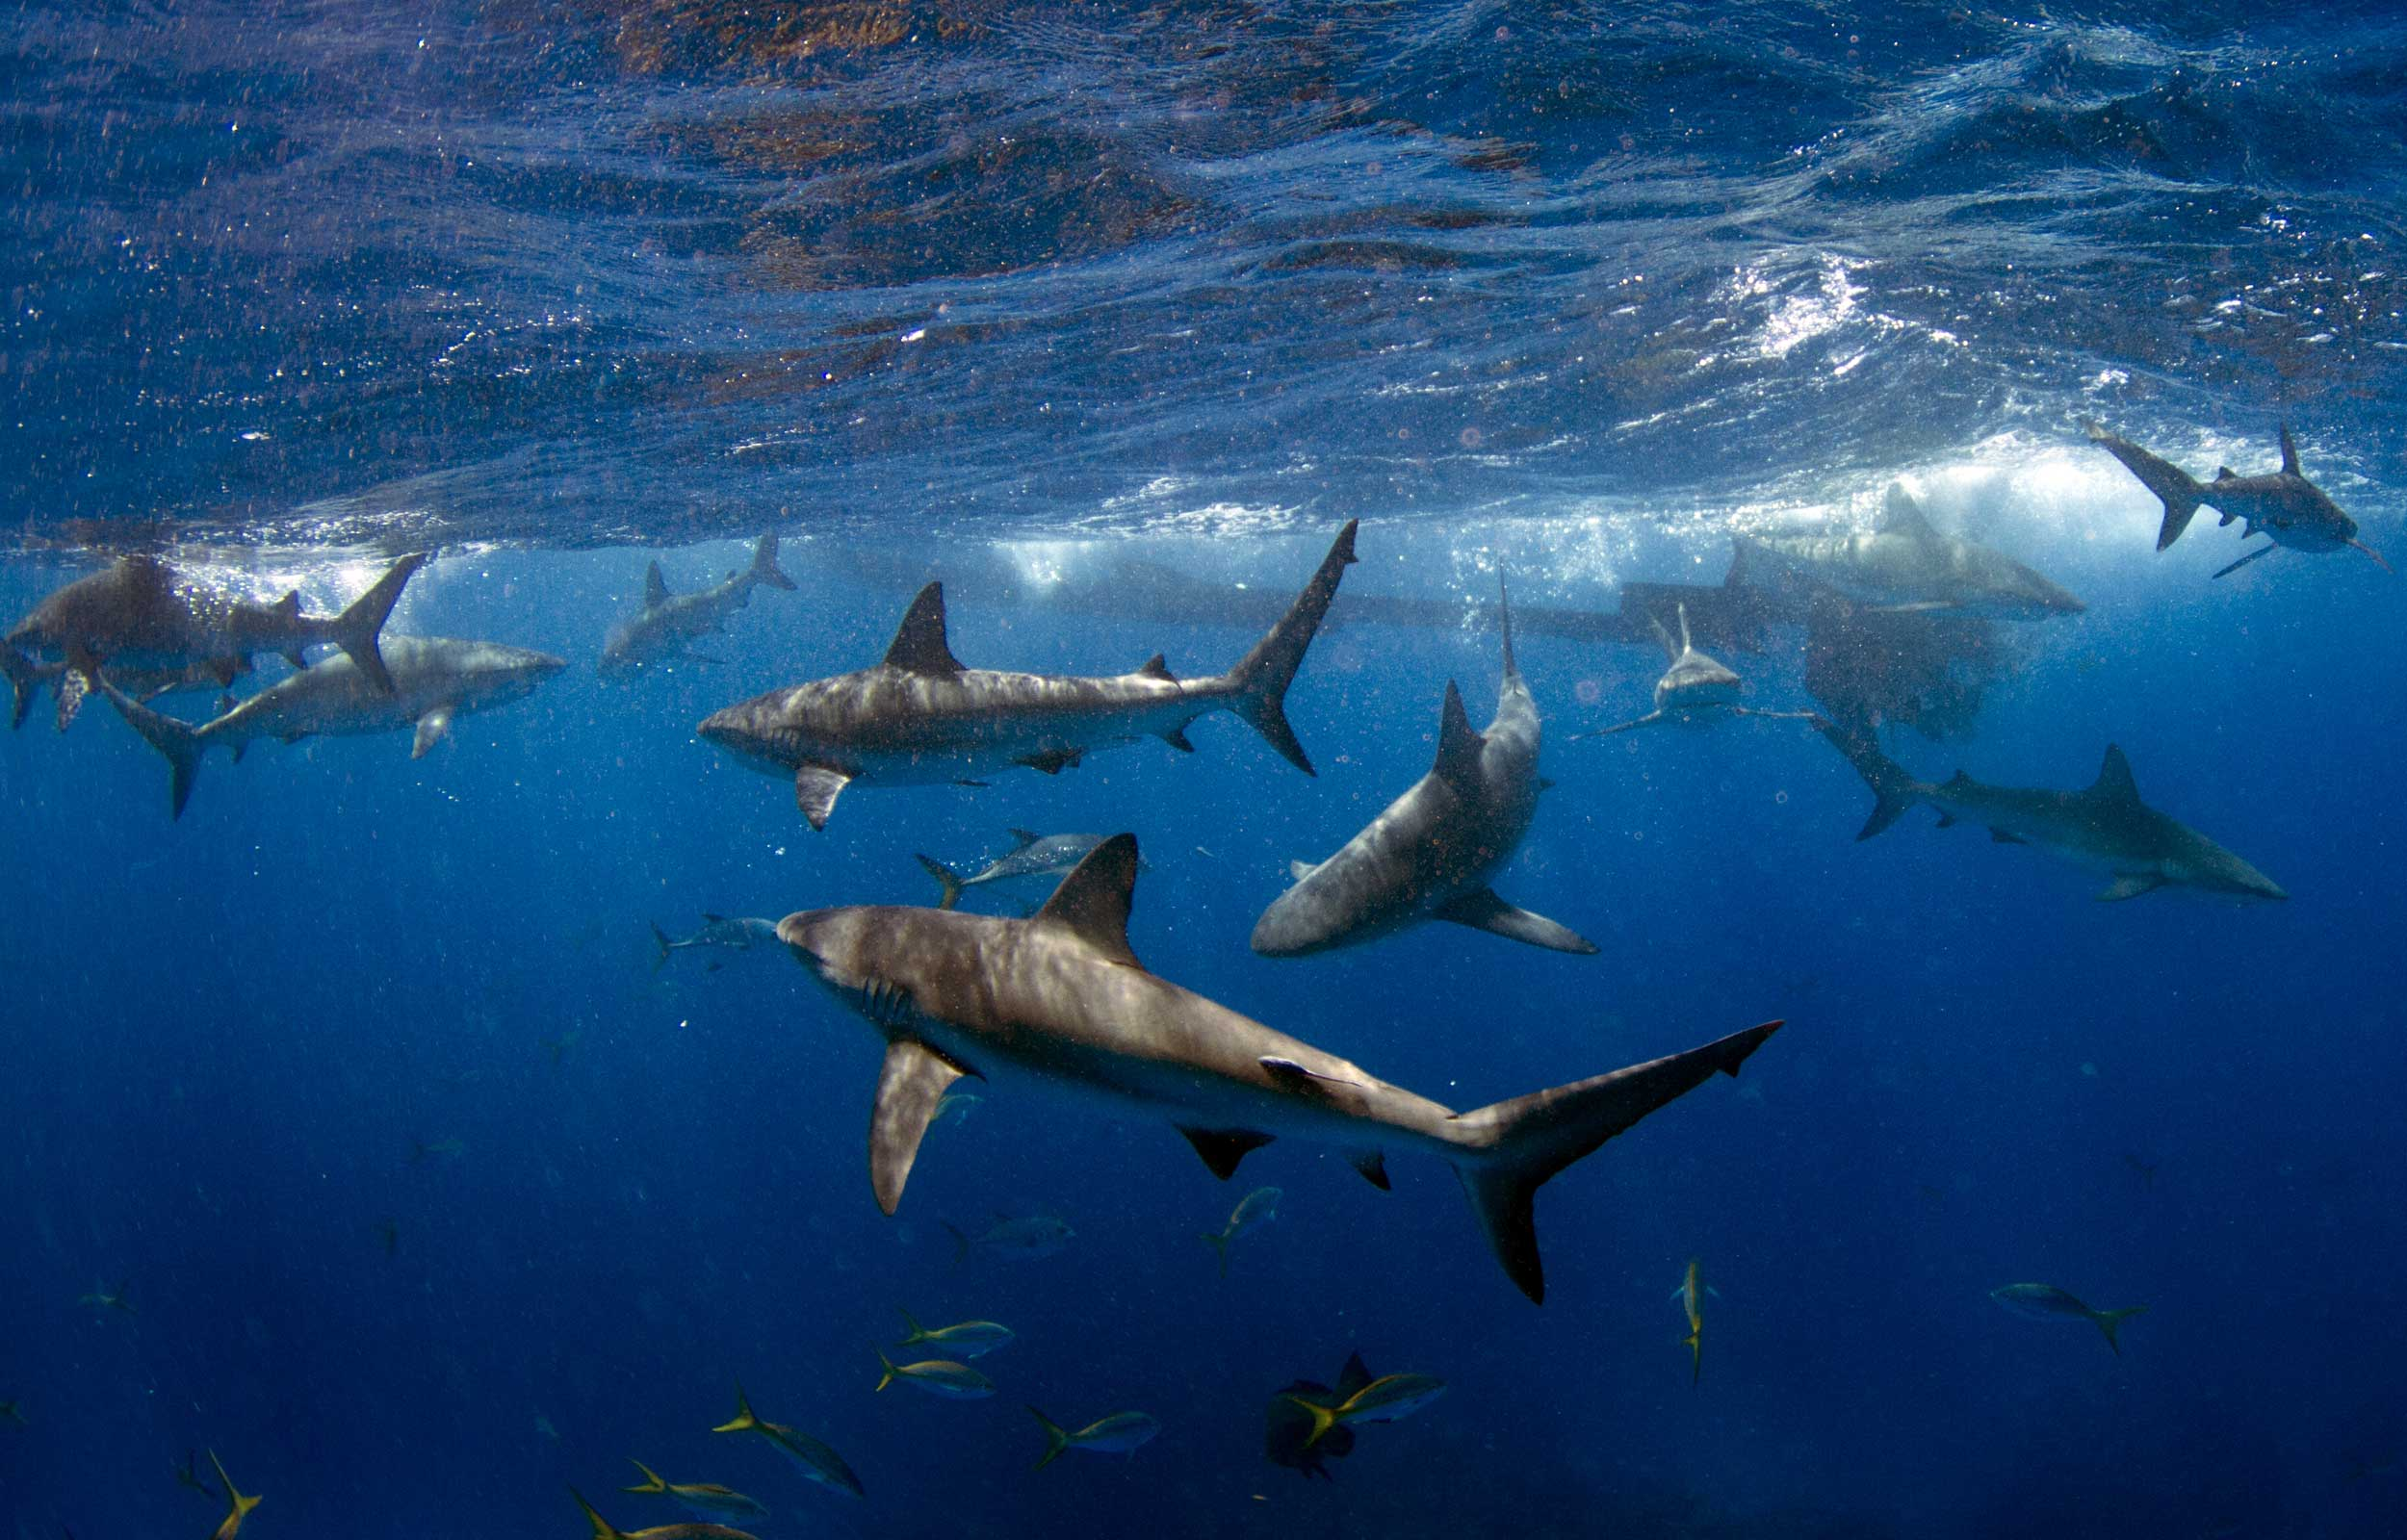 Key West Fishing Charters | Far Out Fishing – Capt. Chris Mendola